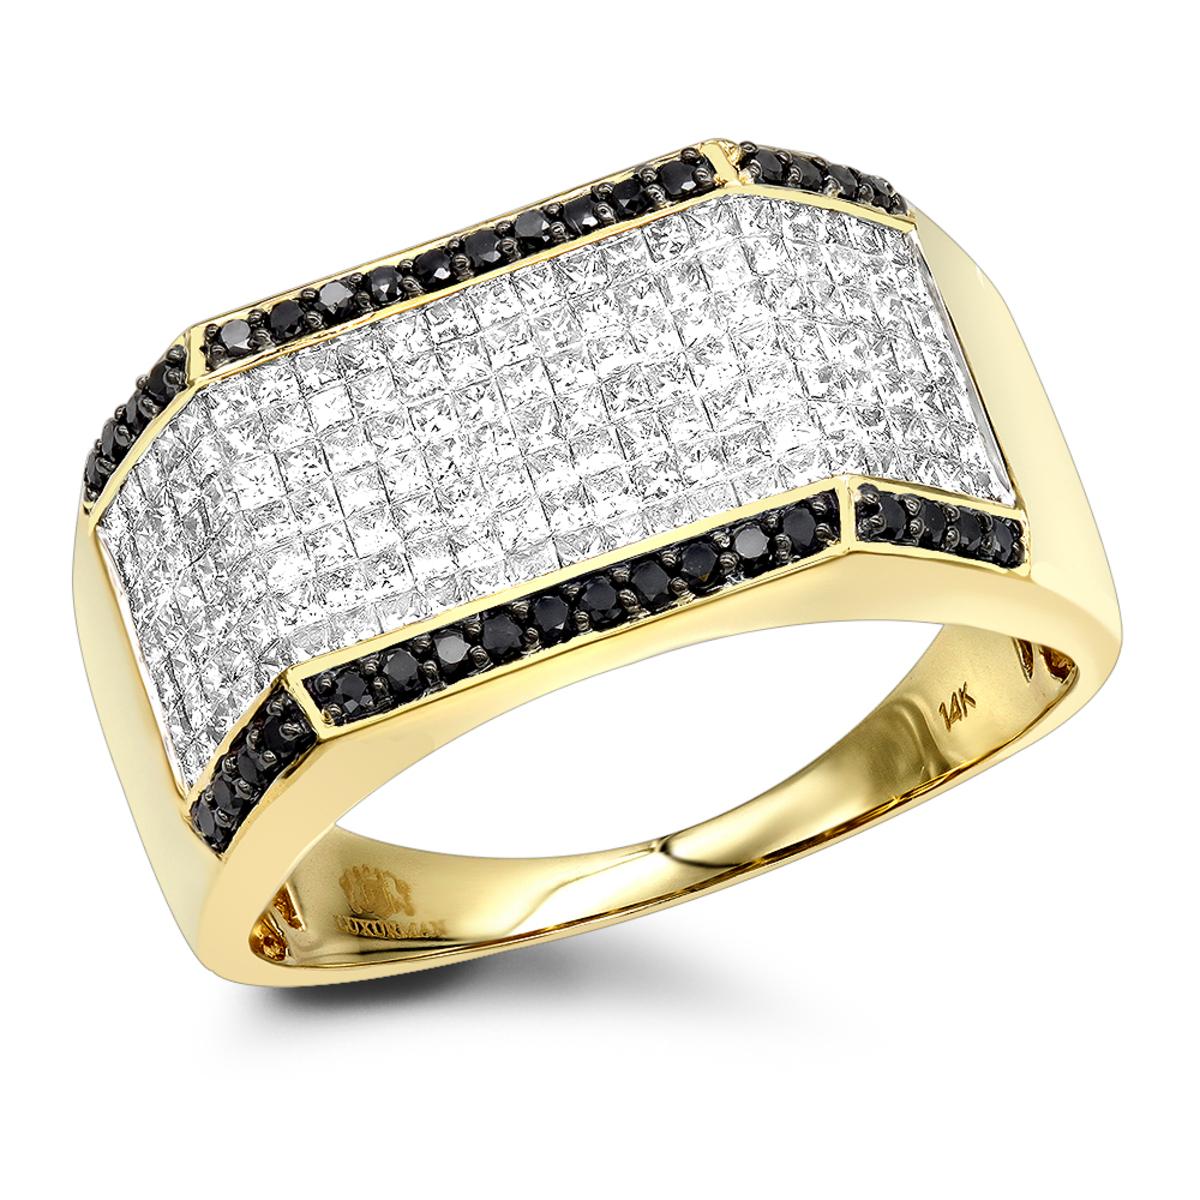 14K Gold Black White Round Princess Diamond Ring for Men 2.2ct by Luxurman